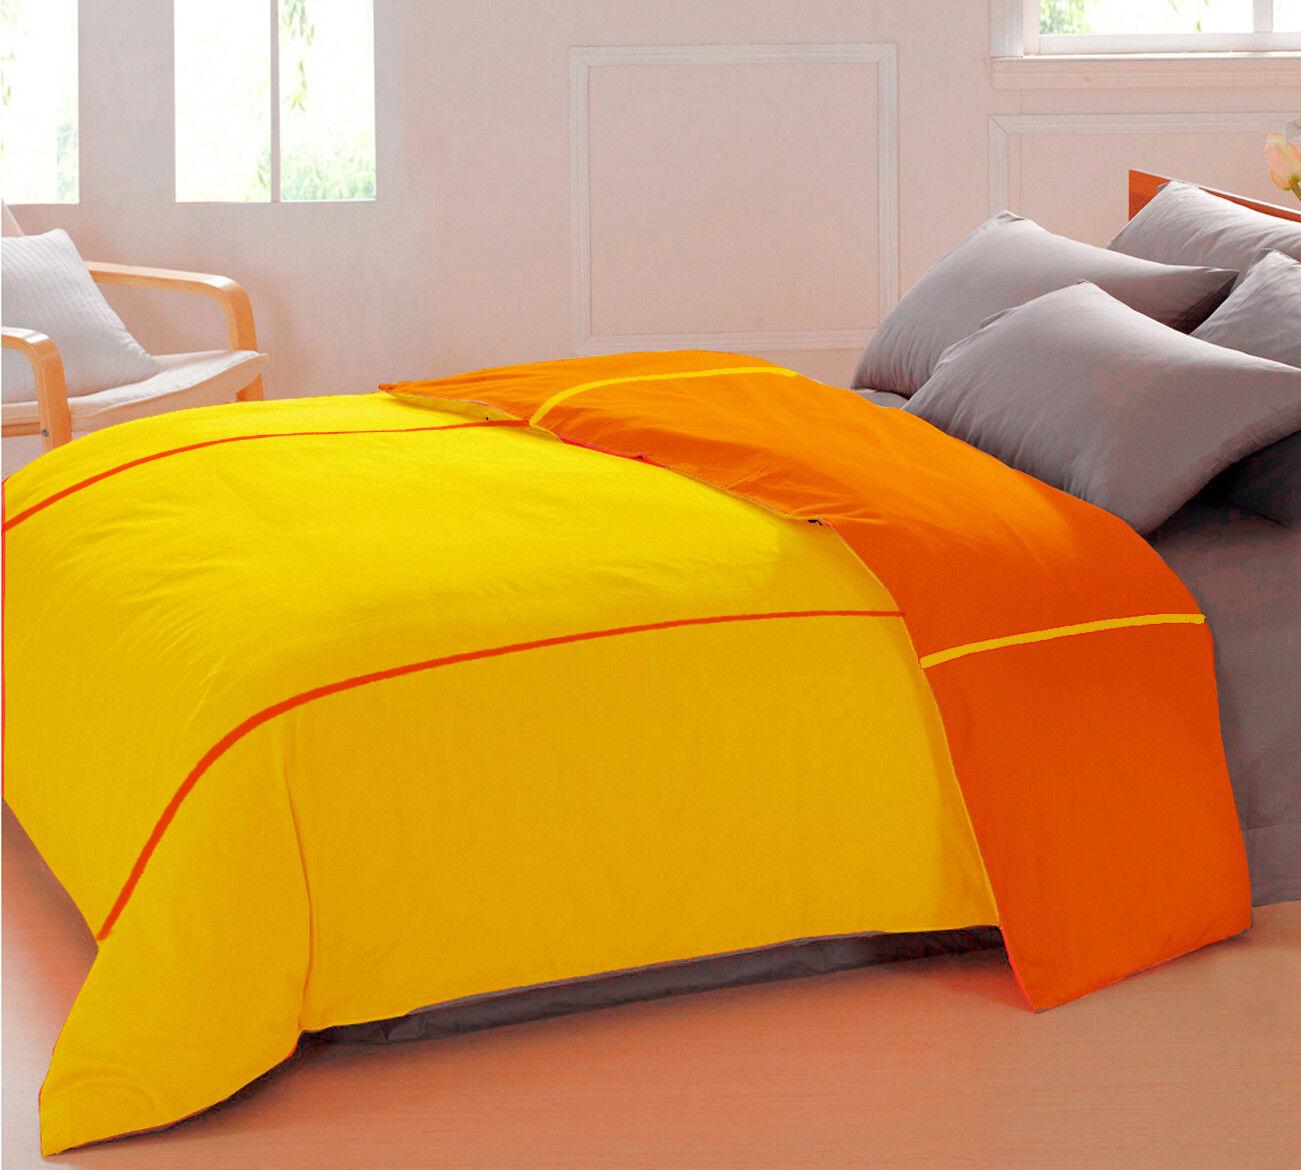 Duvet Cover Home Decorrative Dimensione=Single  Double  King Cotton Dual Coloreeee